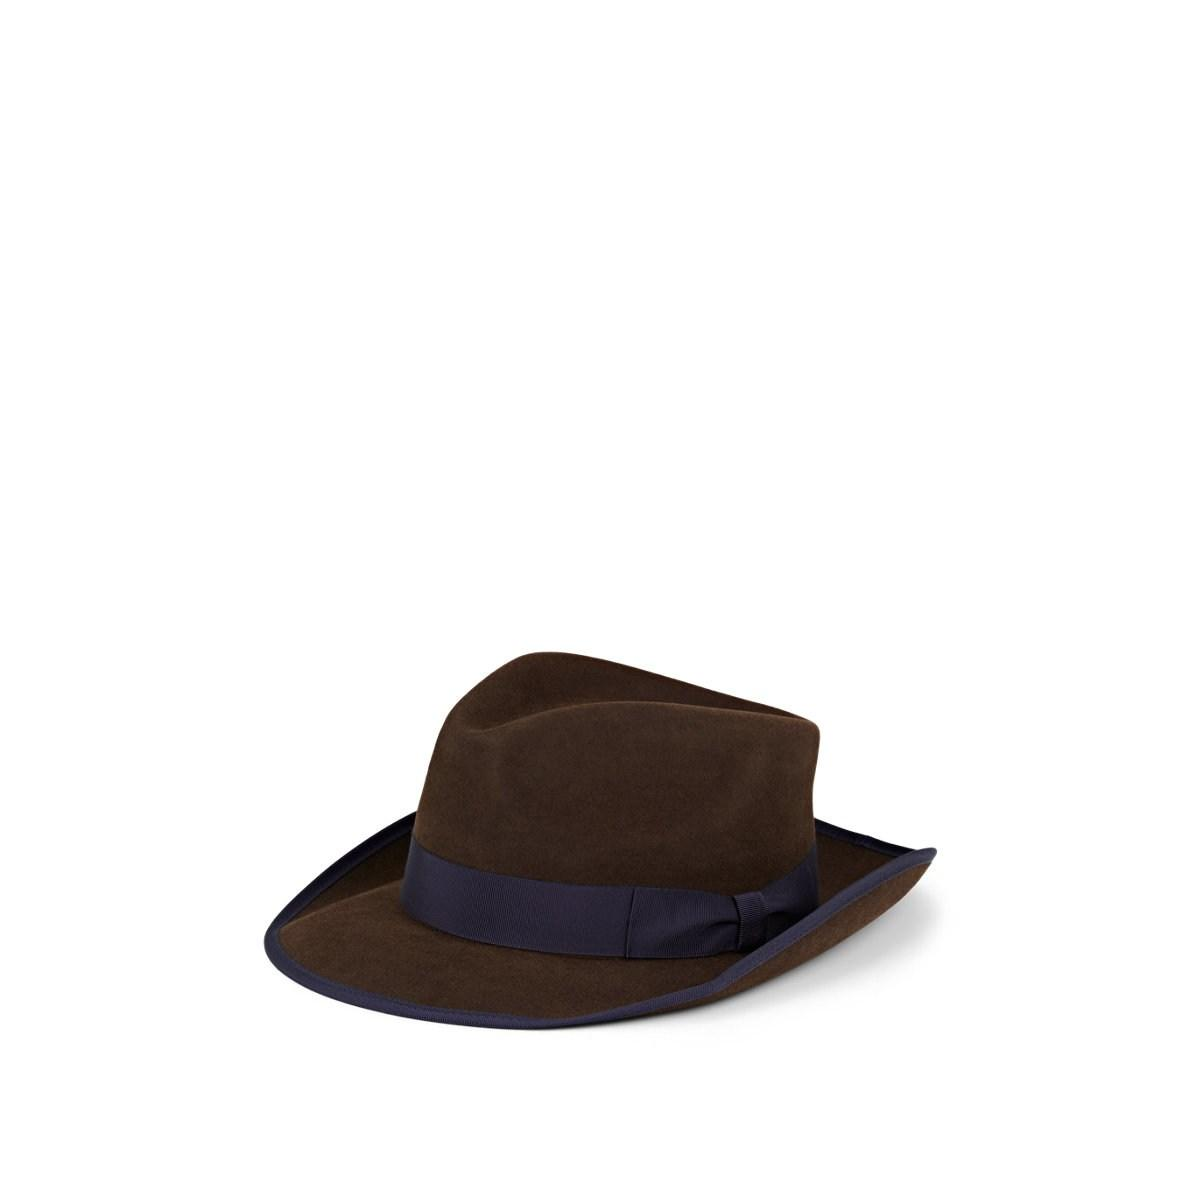 8a7382537a7ae0 Lyst - Lock & Co Pickering Rabbit Fur Felt Trilby in Brown for Men